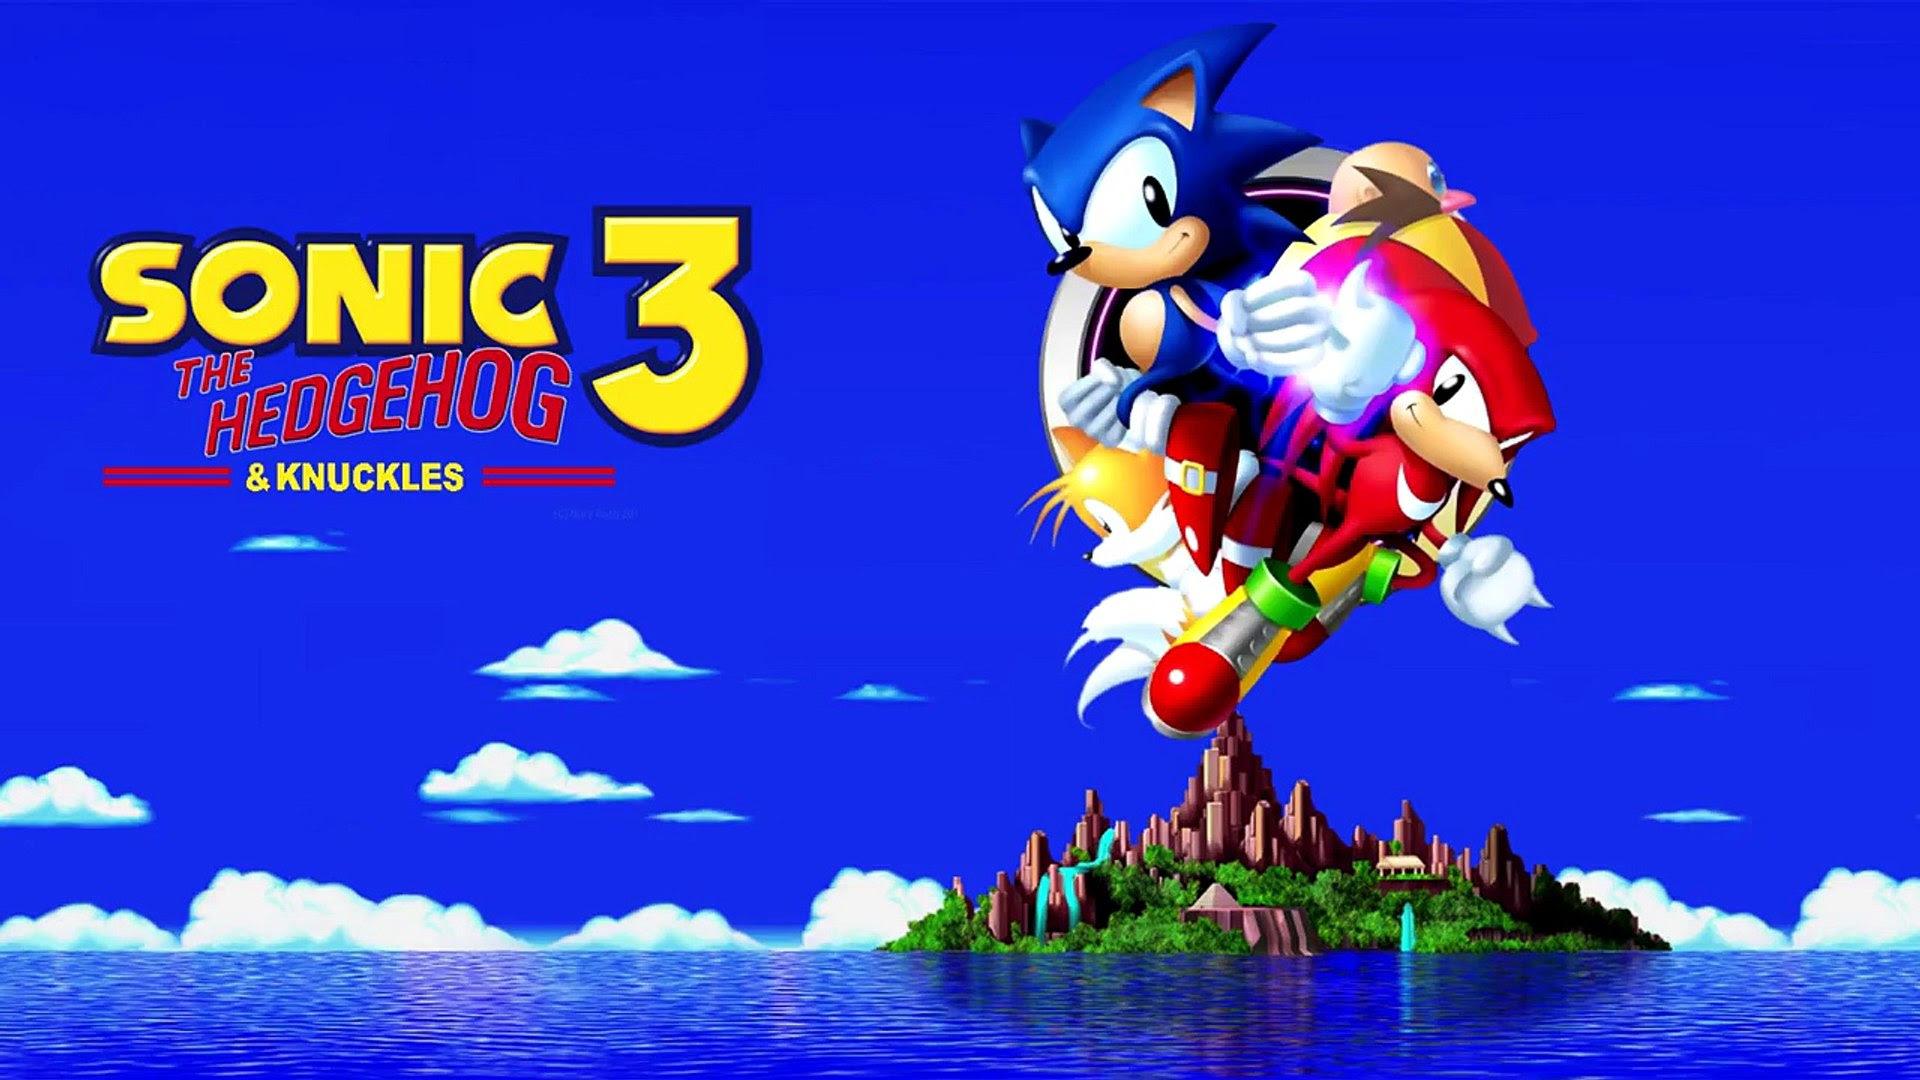 Sonic 20 And Knuckles   xloimsei